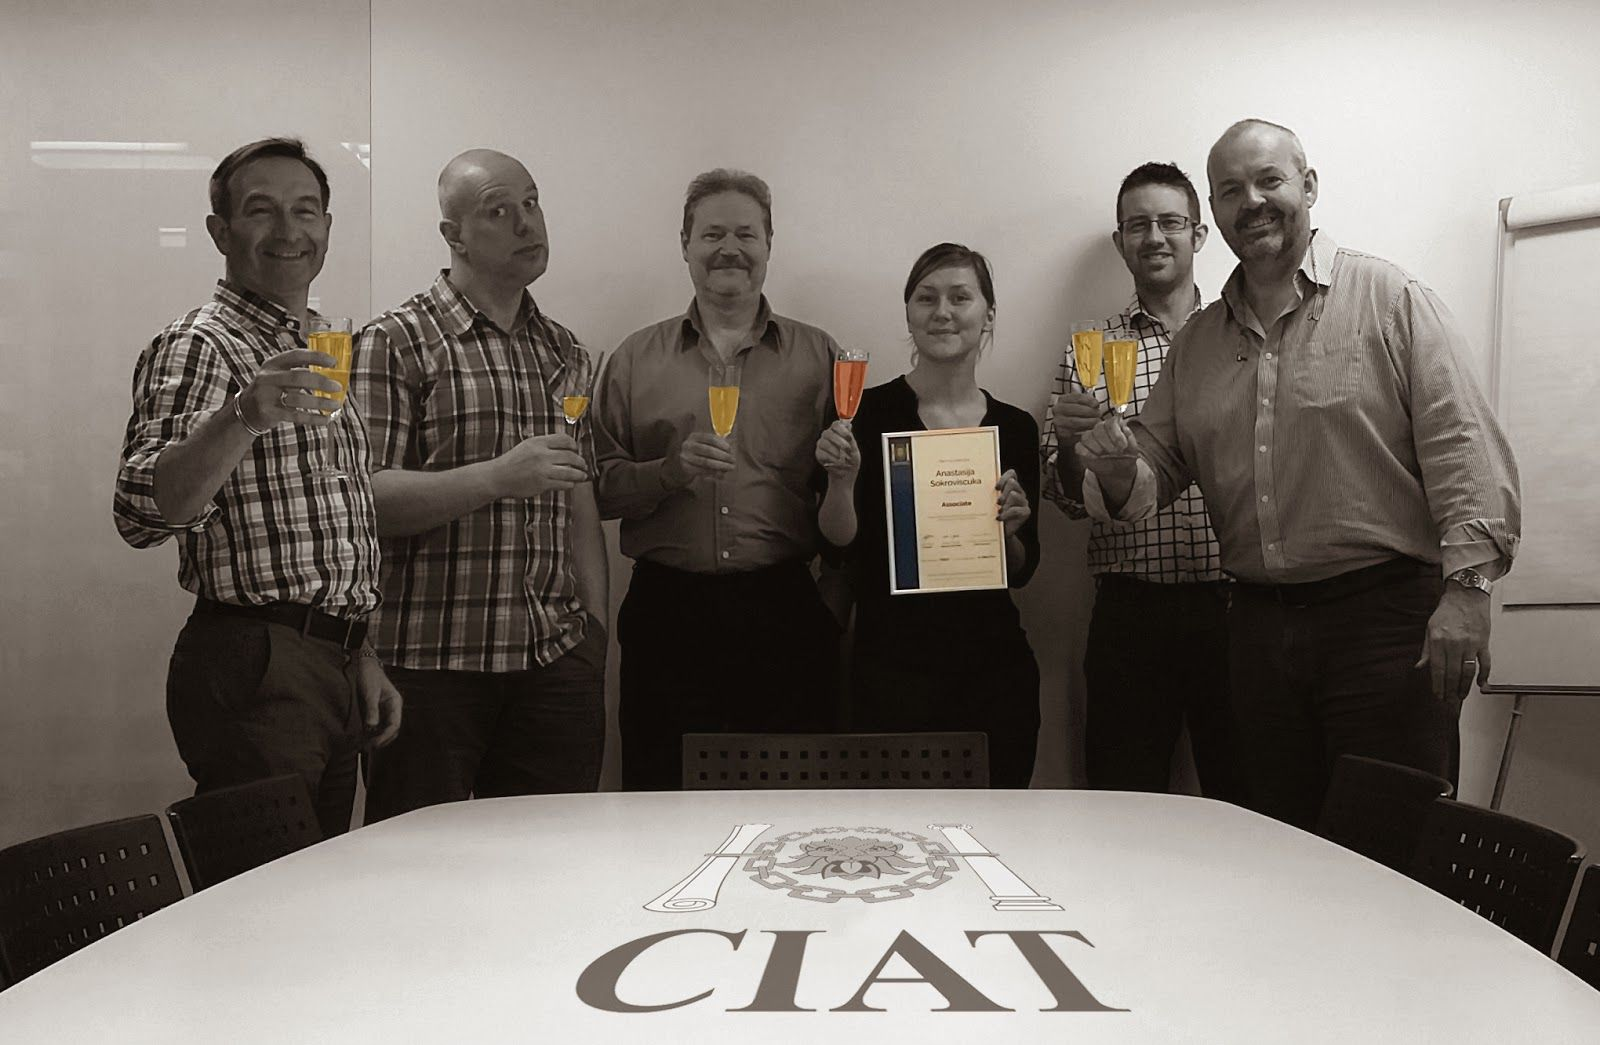 Stephen George & Partners LLP: CIAT MEMBERSHIP FOR NASTJA